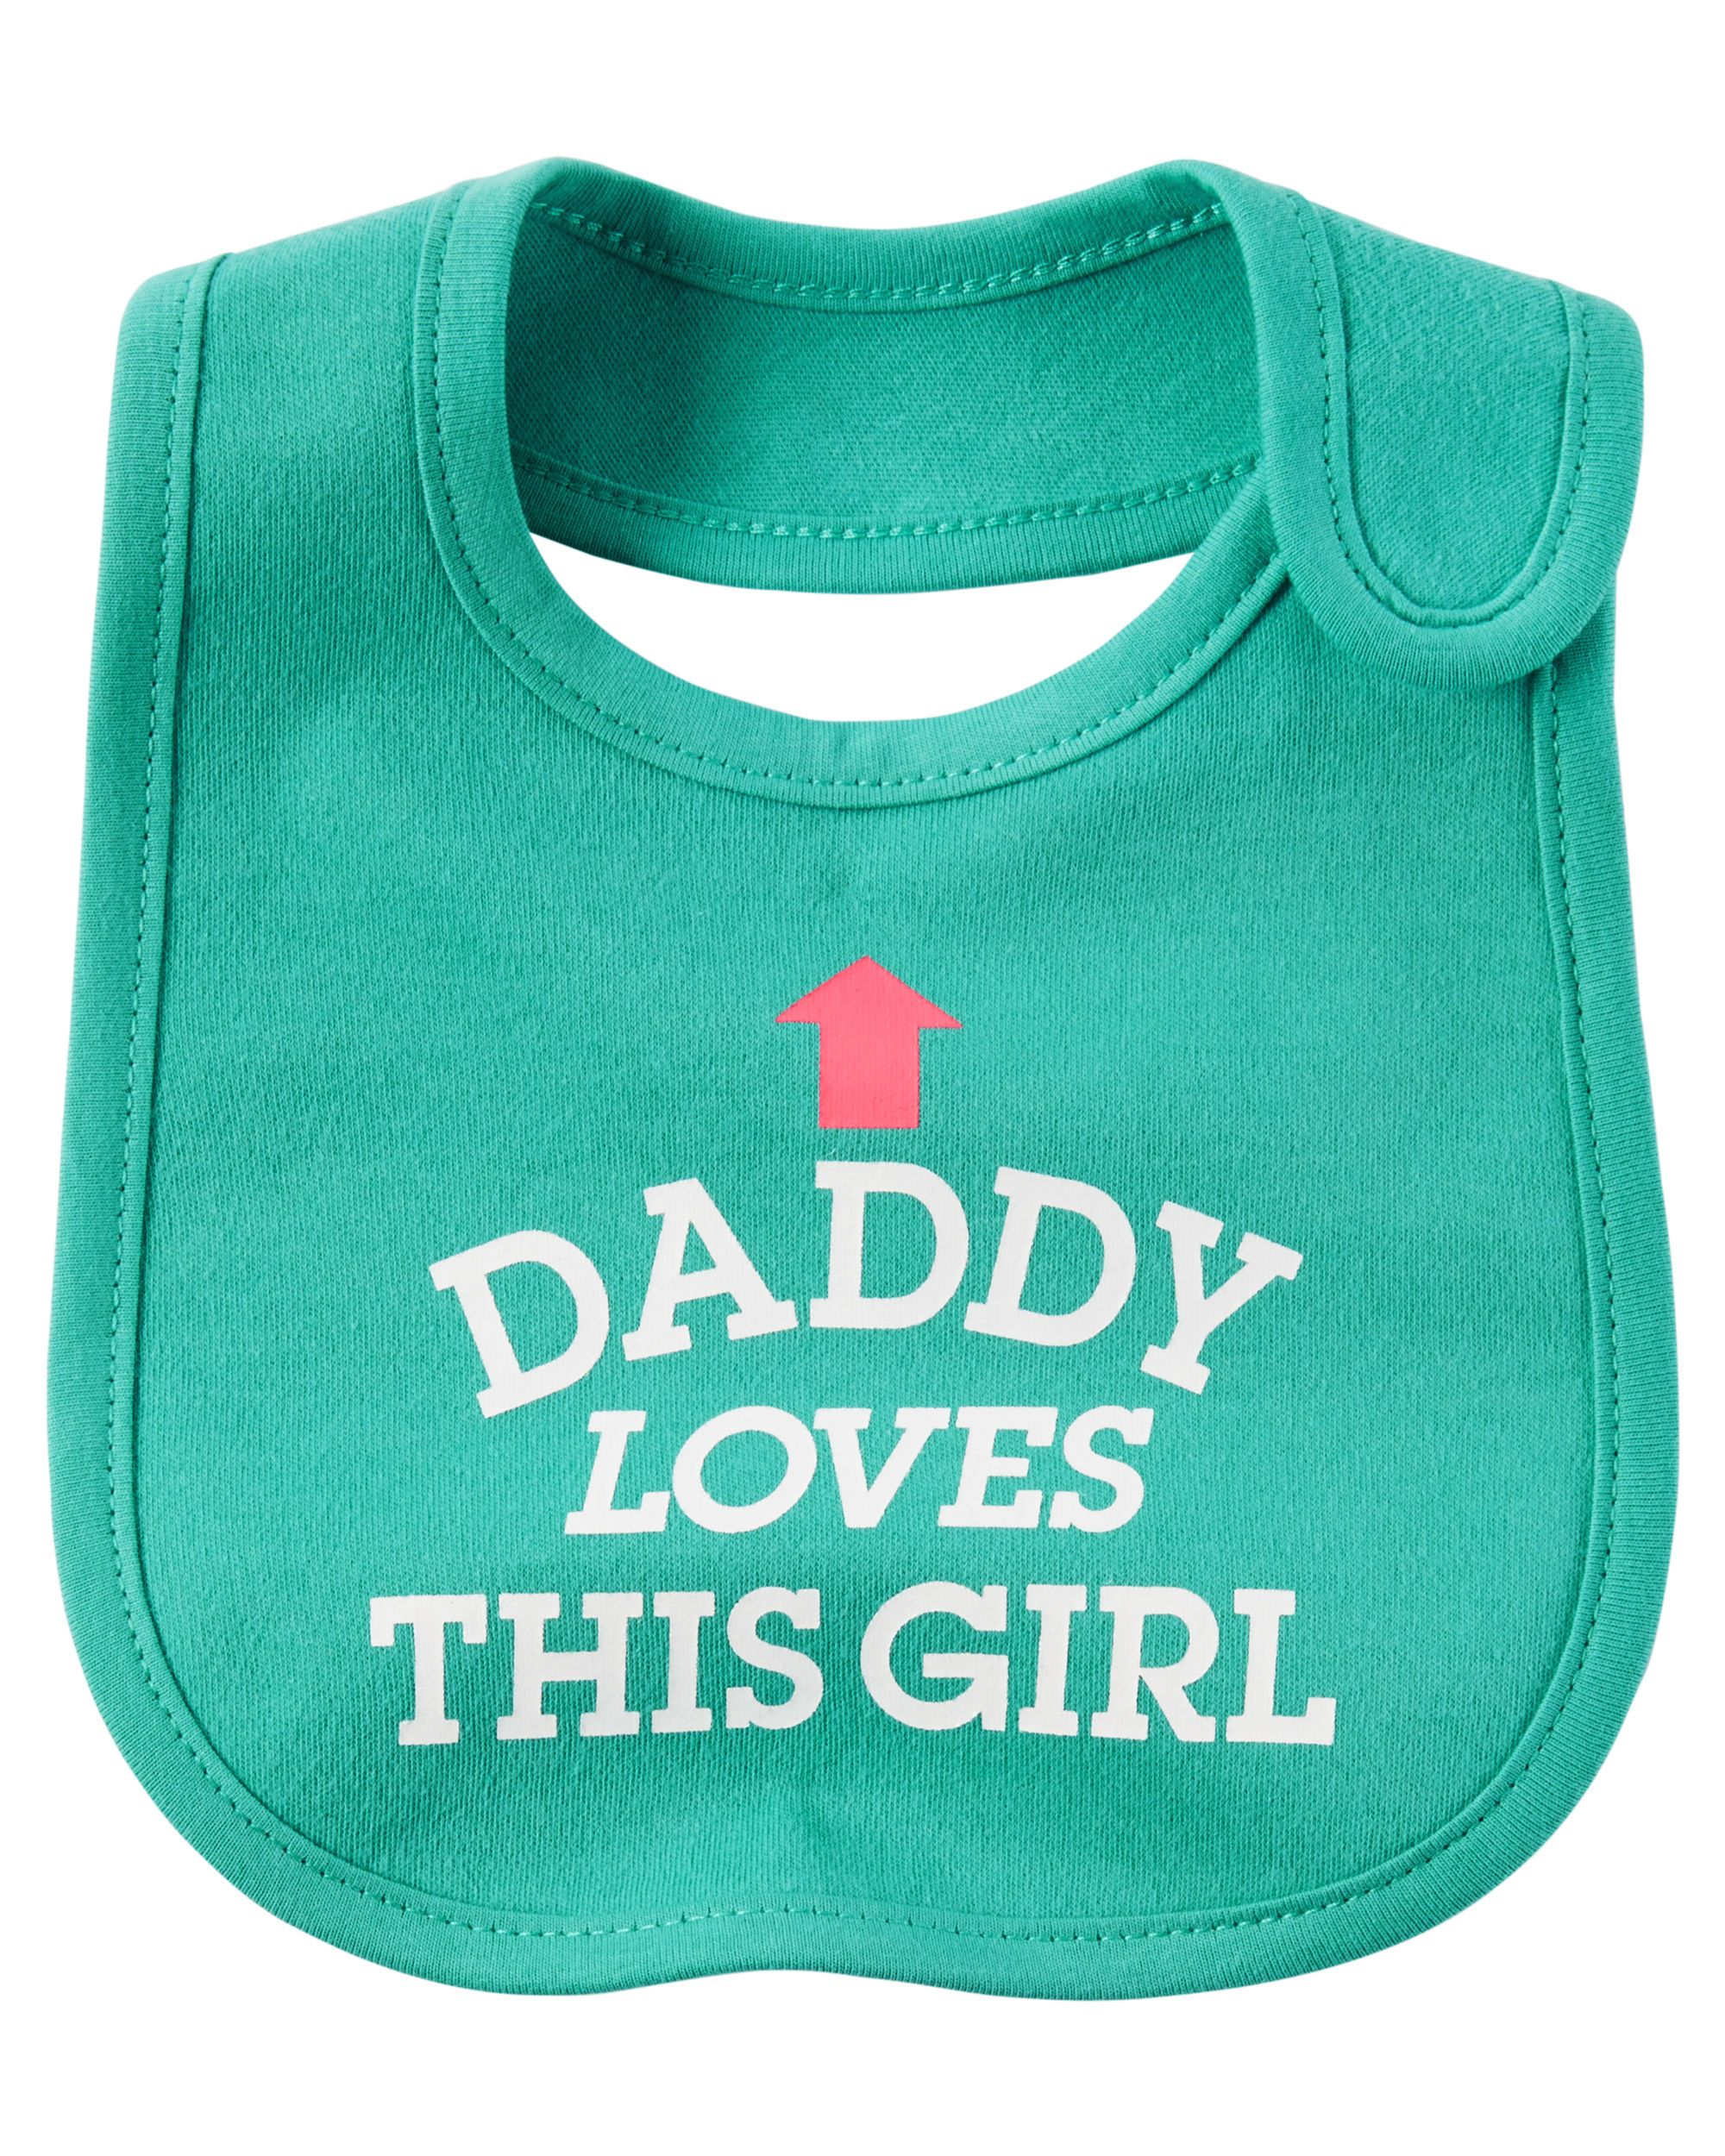 Baby Girl Daddy Loves This Girl Teething Bib | Carters.com